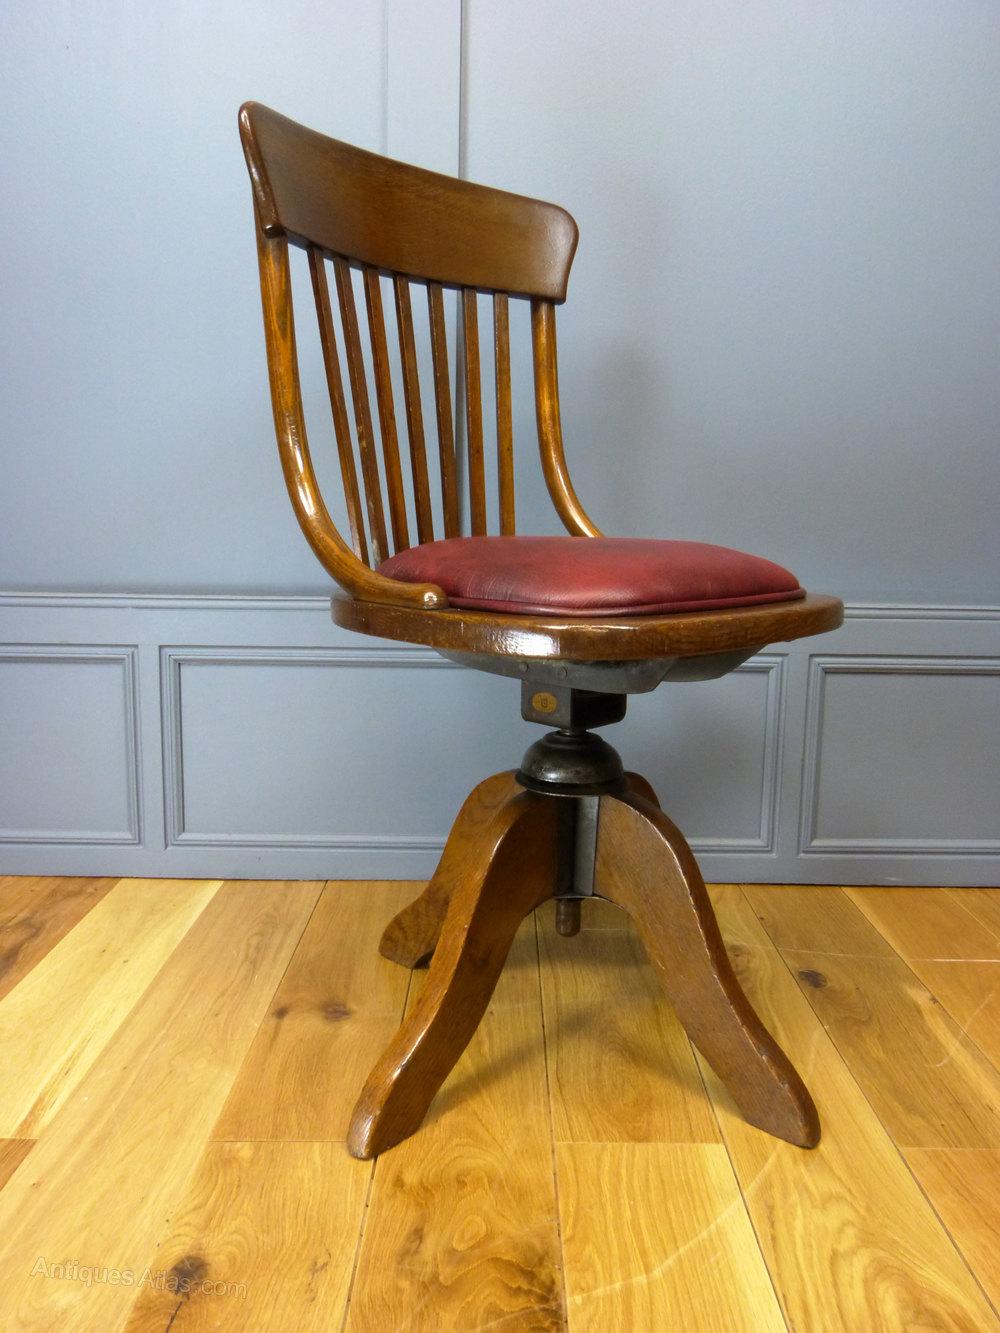 Edwardian Bentwood Desk Chair  Antiques Atlas